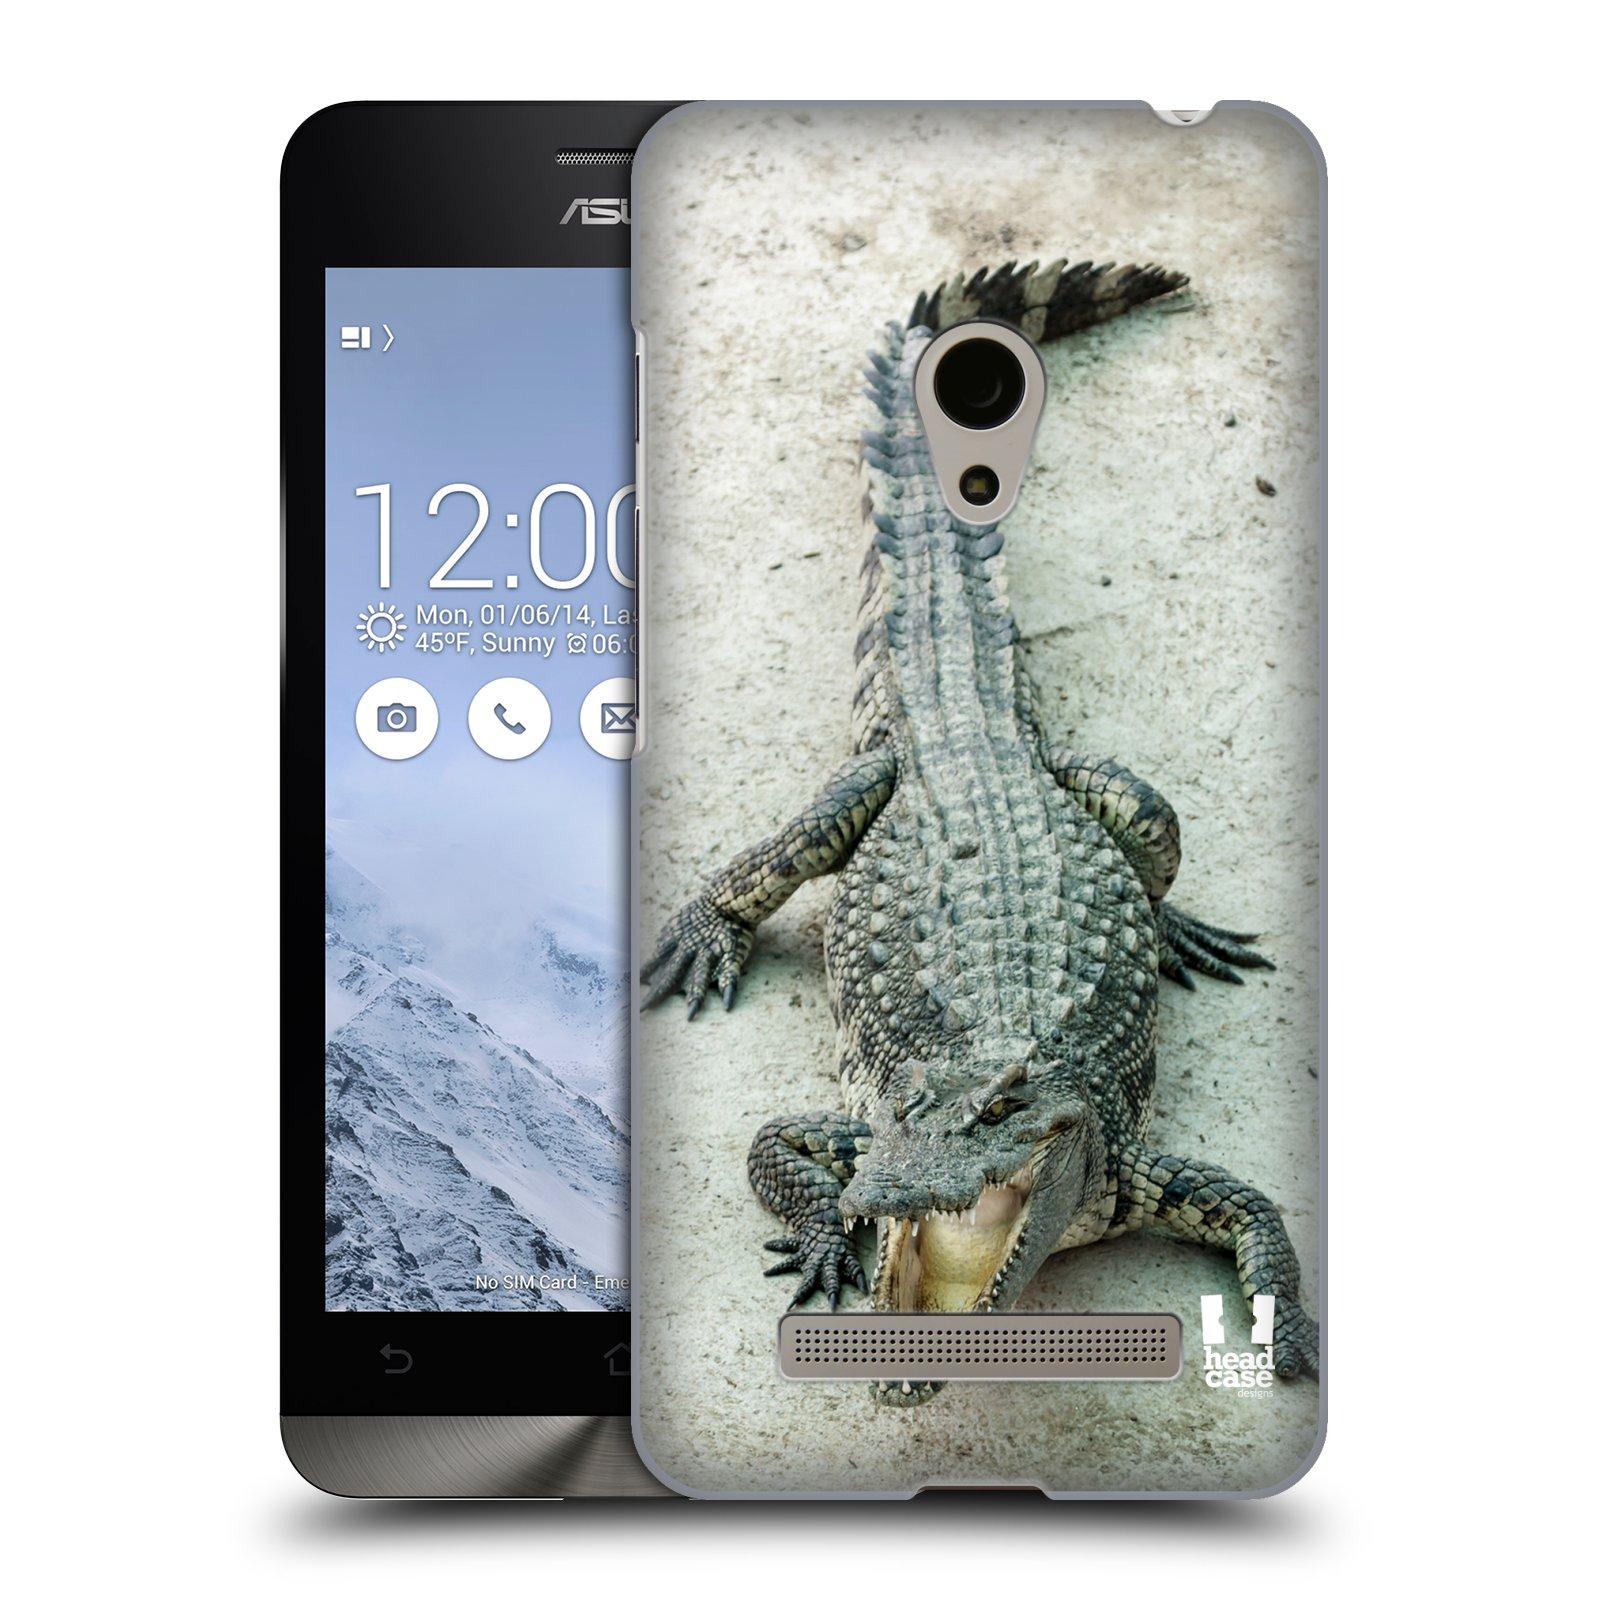 HEAD CASE plastový obal na mobil Asus Zenfone 5 vzor Divočina, Divoký život a zvířata foto KROKODÝL, KAJMAN